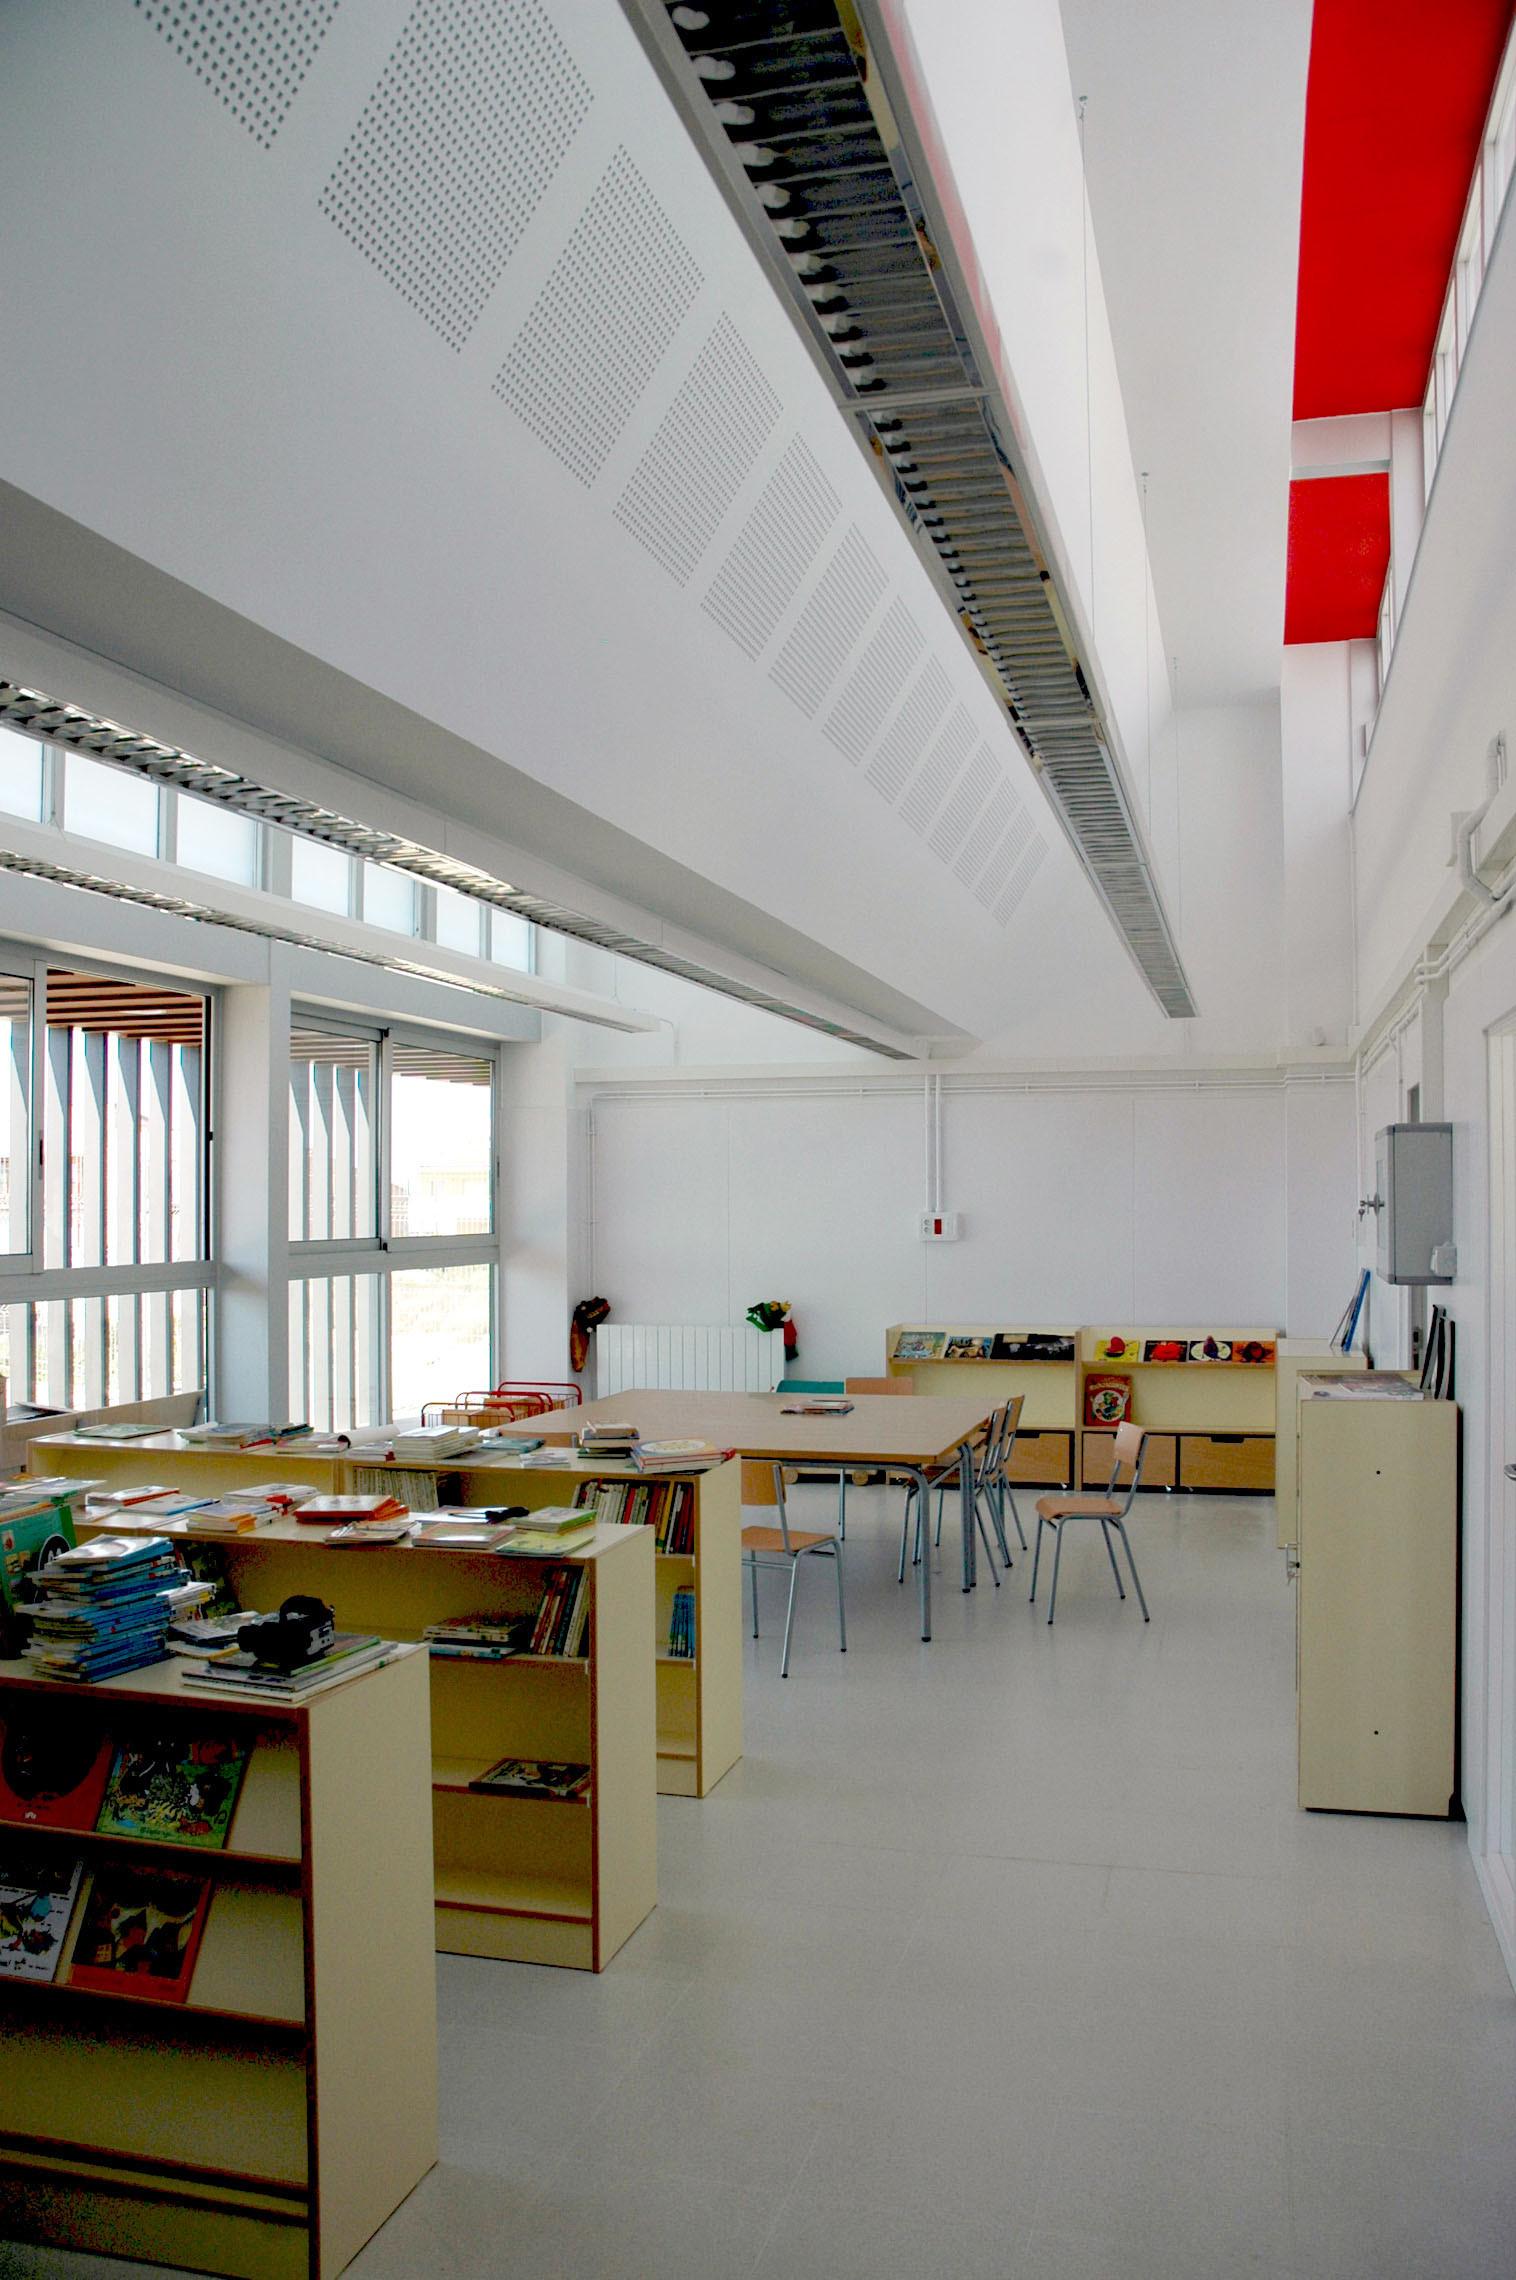 La Fatarella School / Héctor Jala & Mònica Moreno